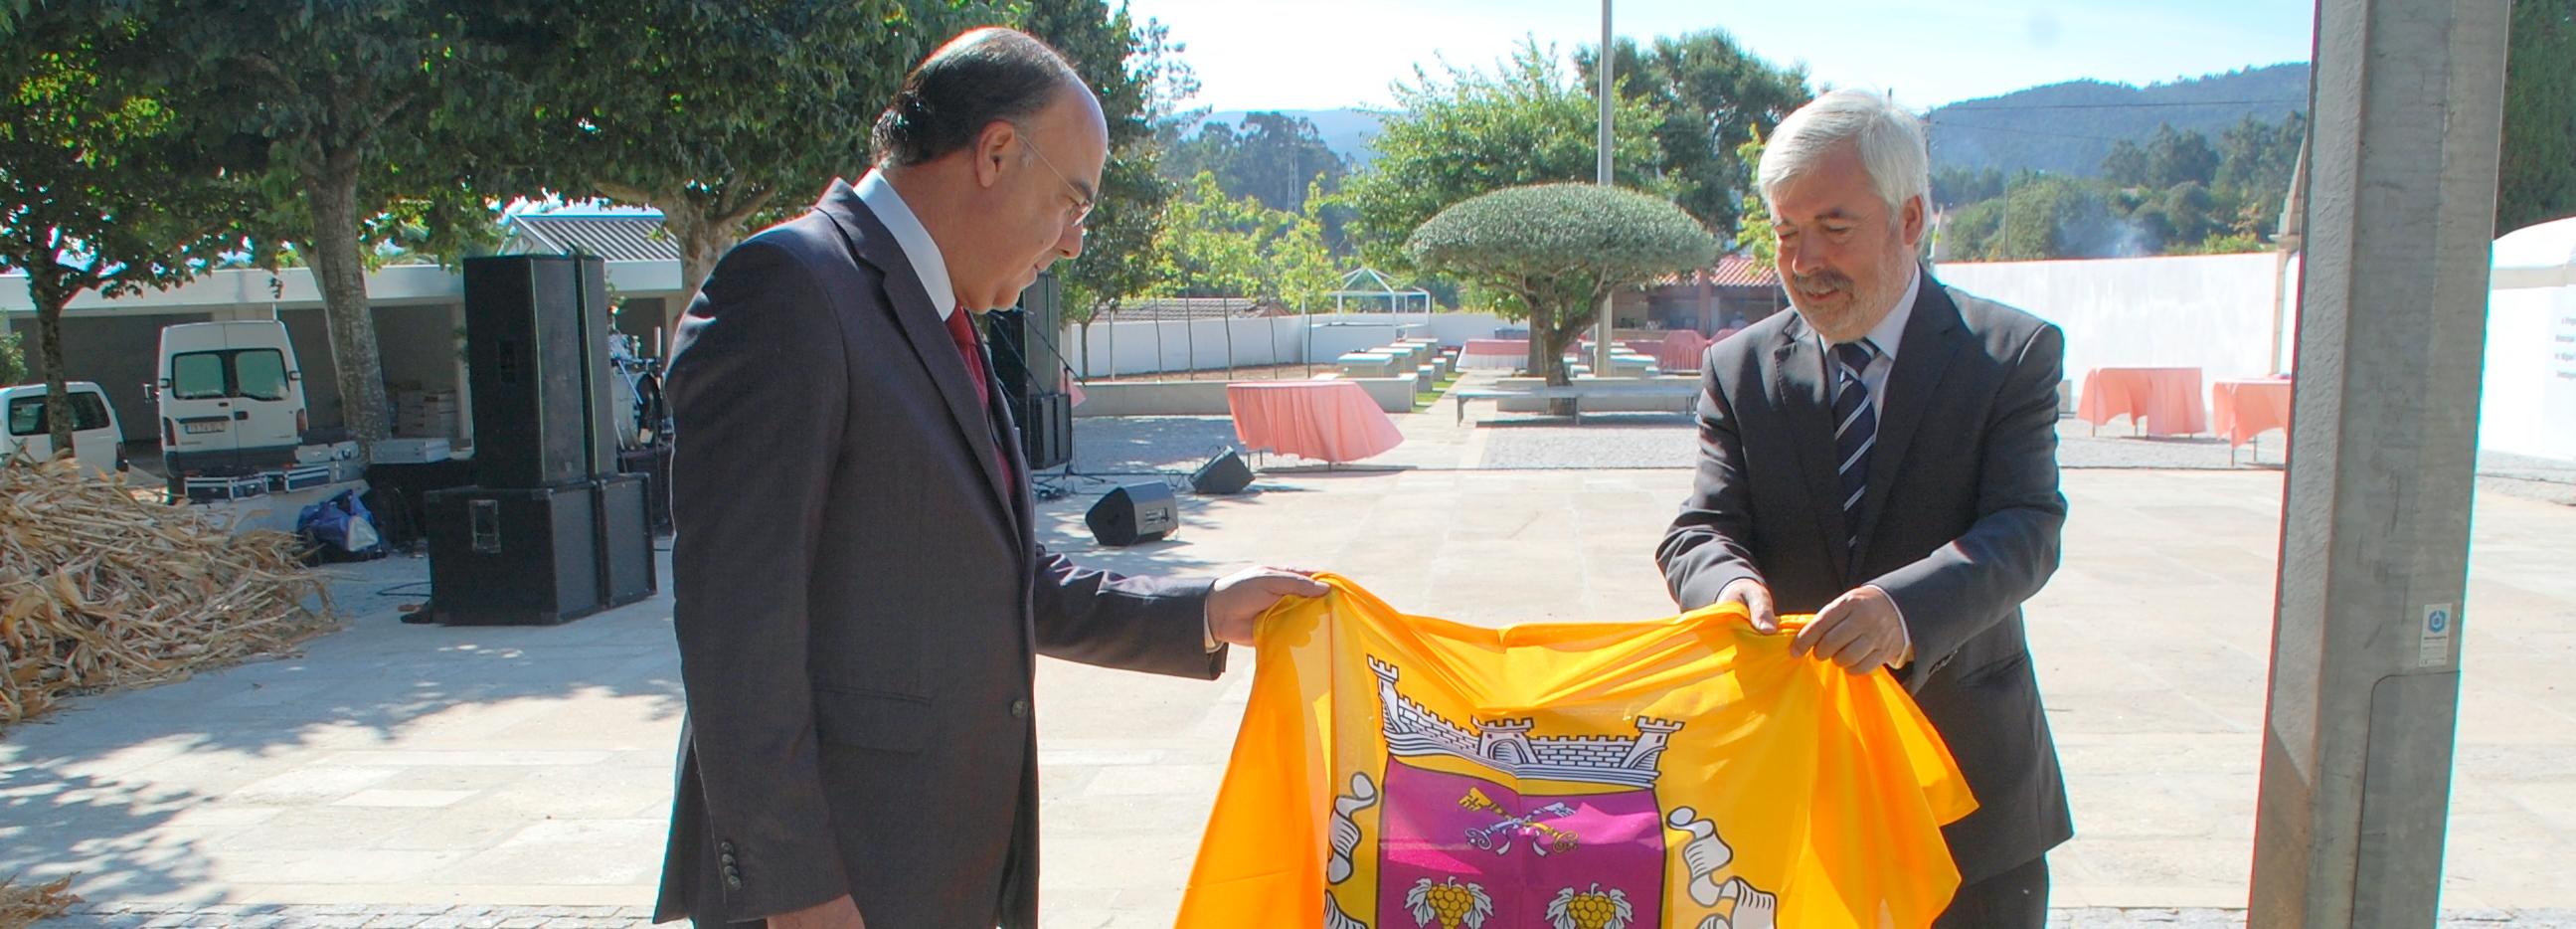 Alvito S. Pedro inaugurou obras na freguesia